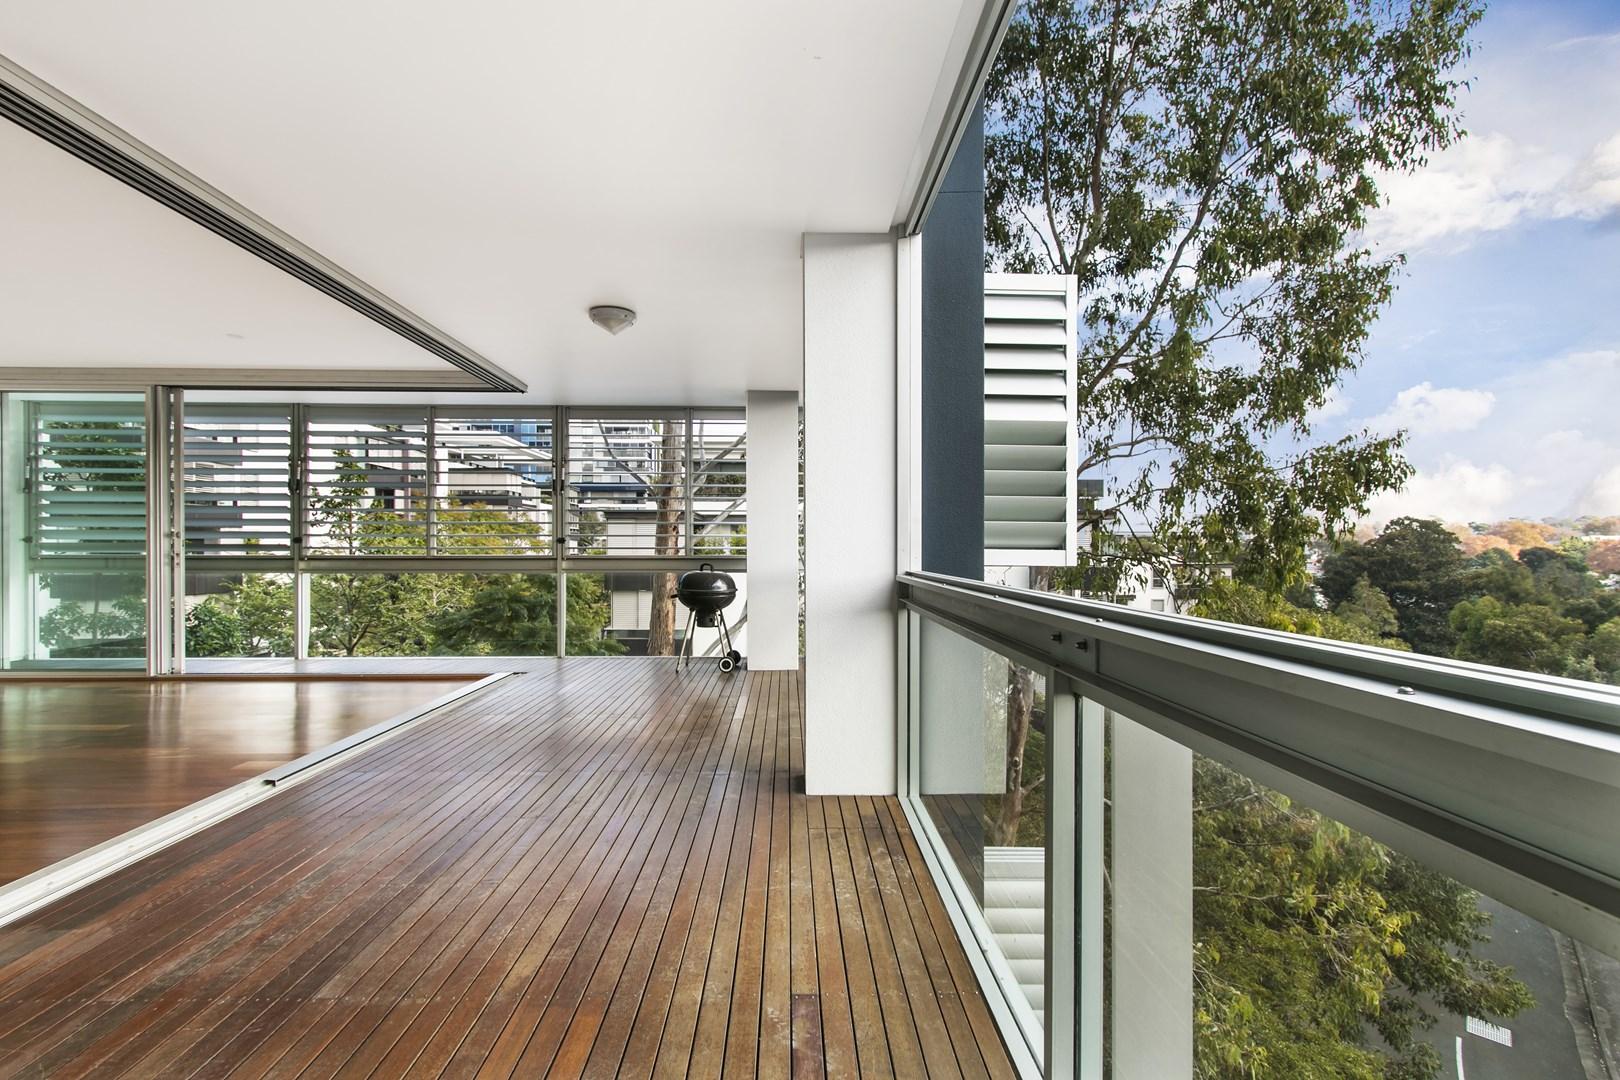 20/4 Alexandra  Drive, Camperdown NSW 2050, Image 0